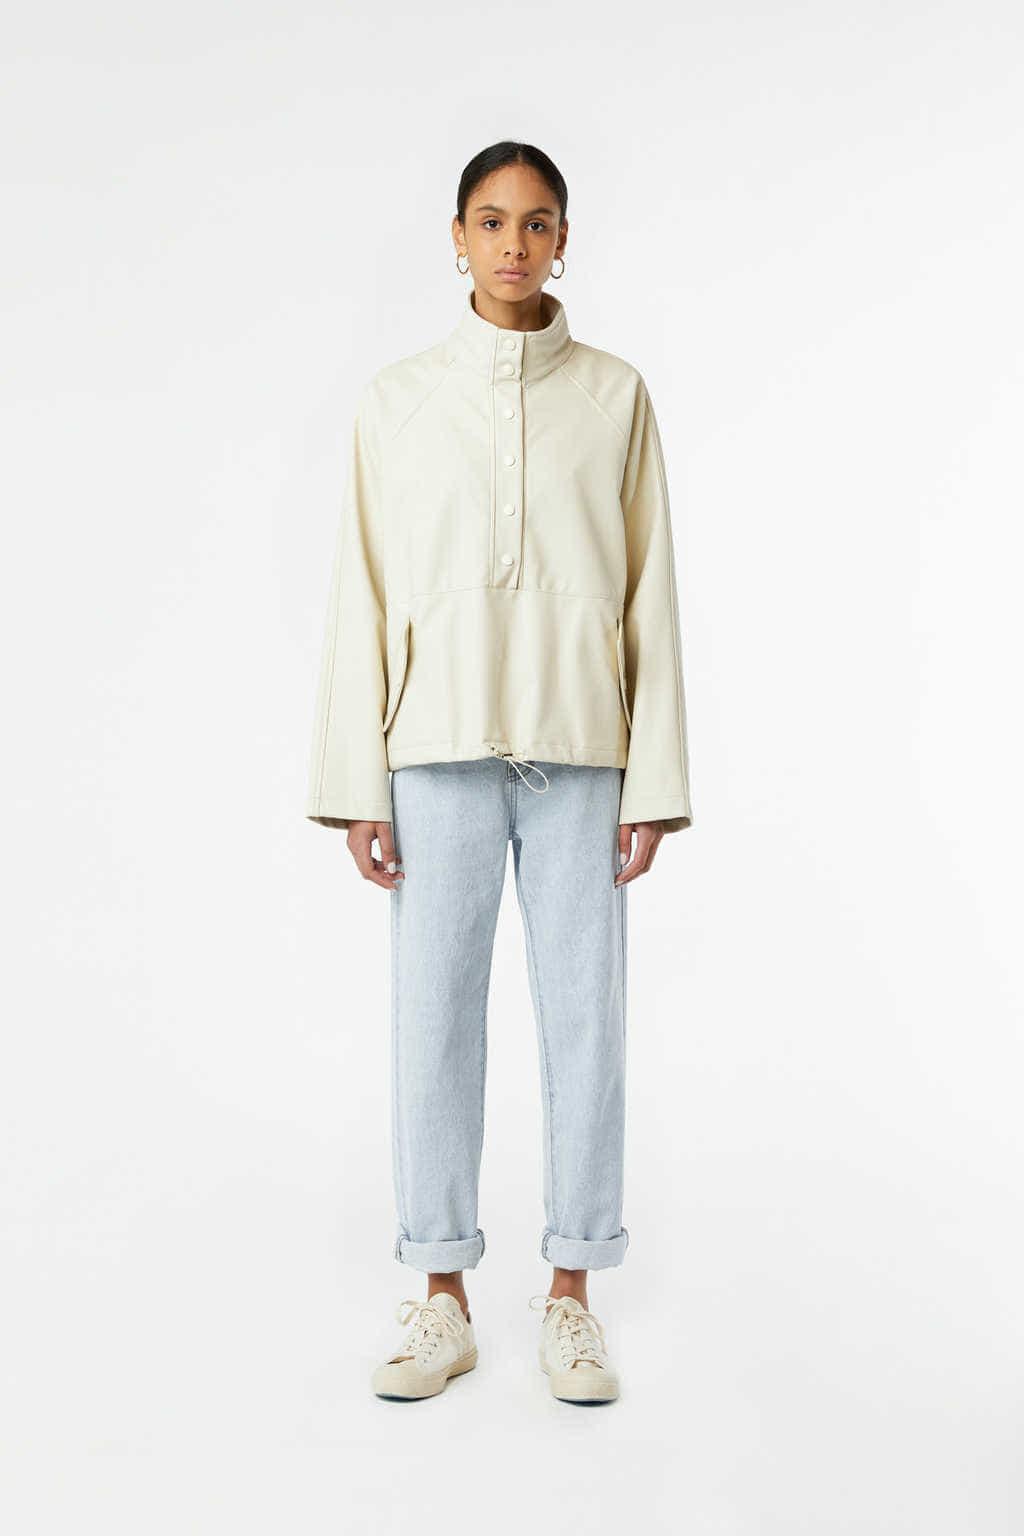 Jacket J001 Cream 2